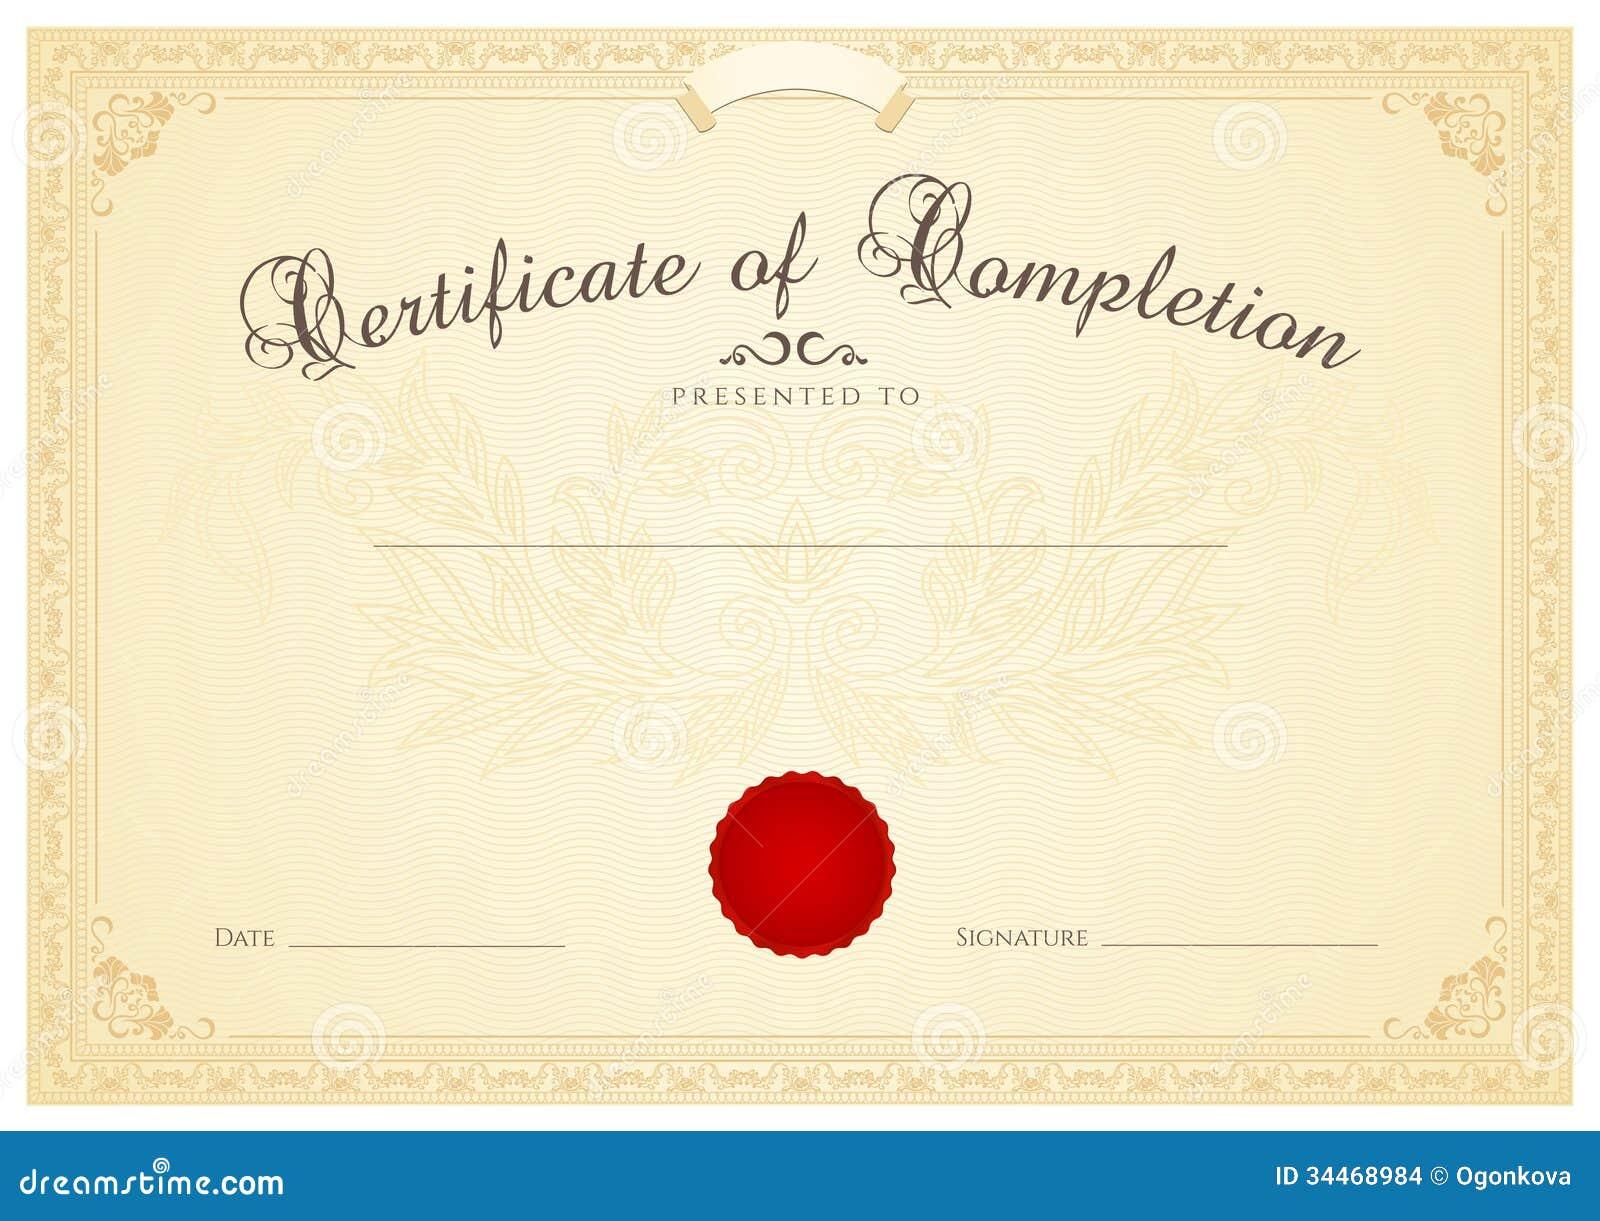 Certifikat-/diplombakgrundsmall. Blom-